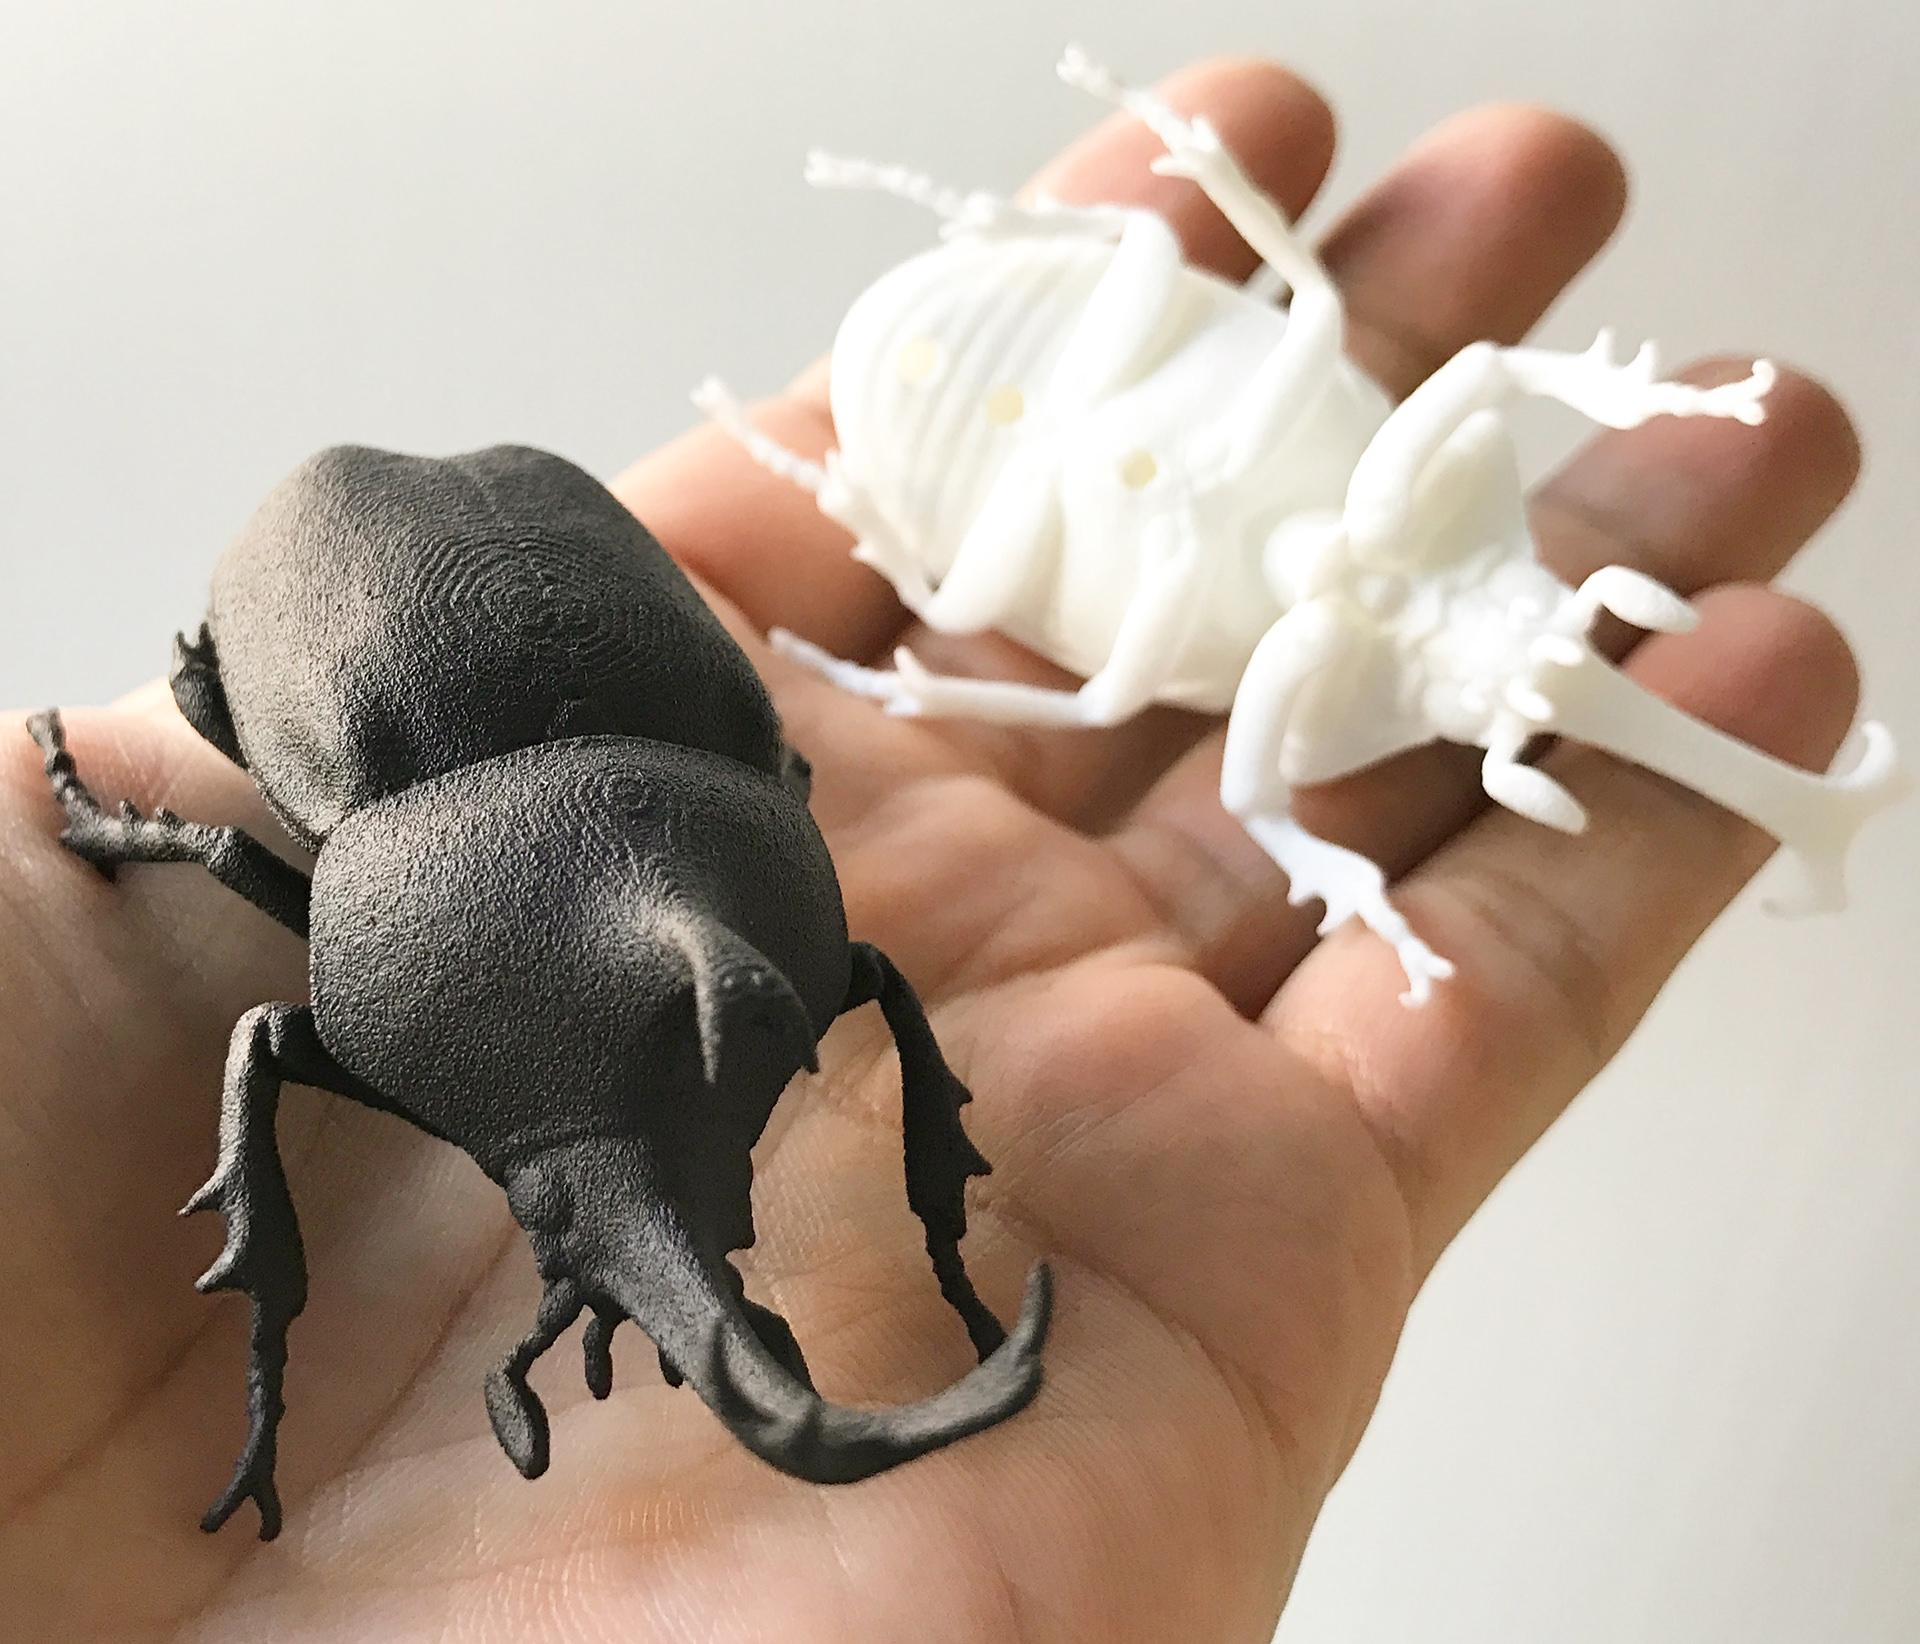 3d-printing-beetle-idarts-5